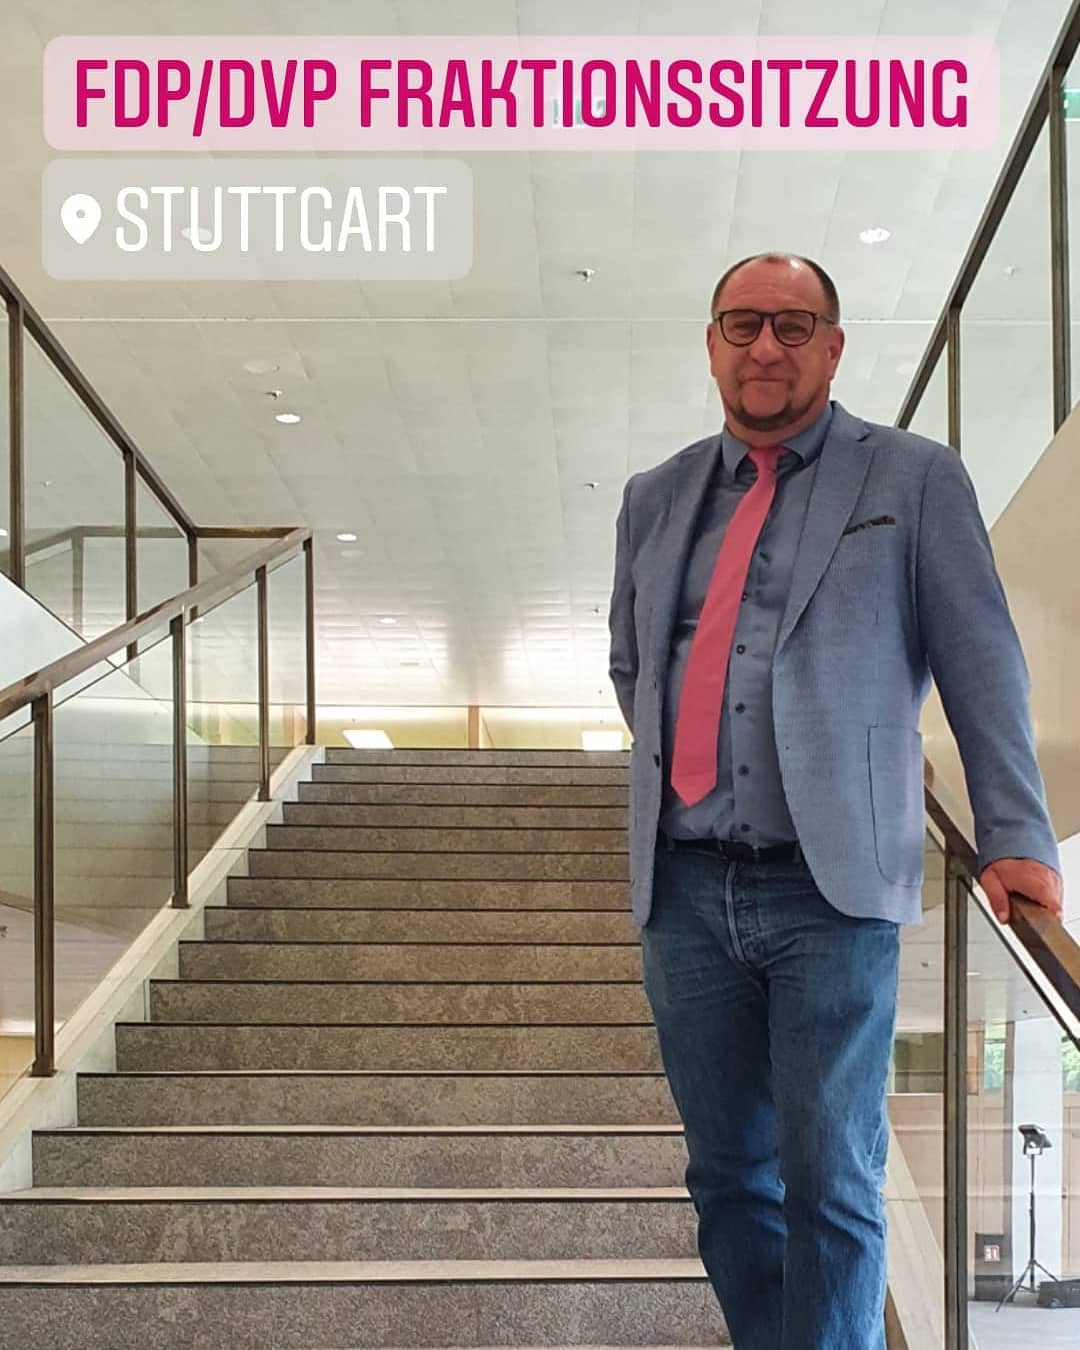 FDP/DVP Fraktionssitzung